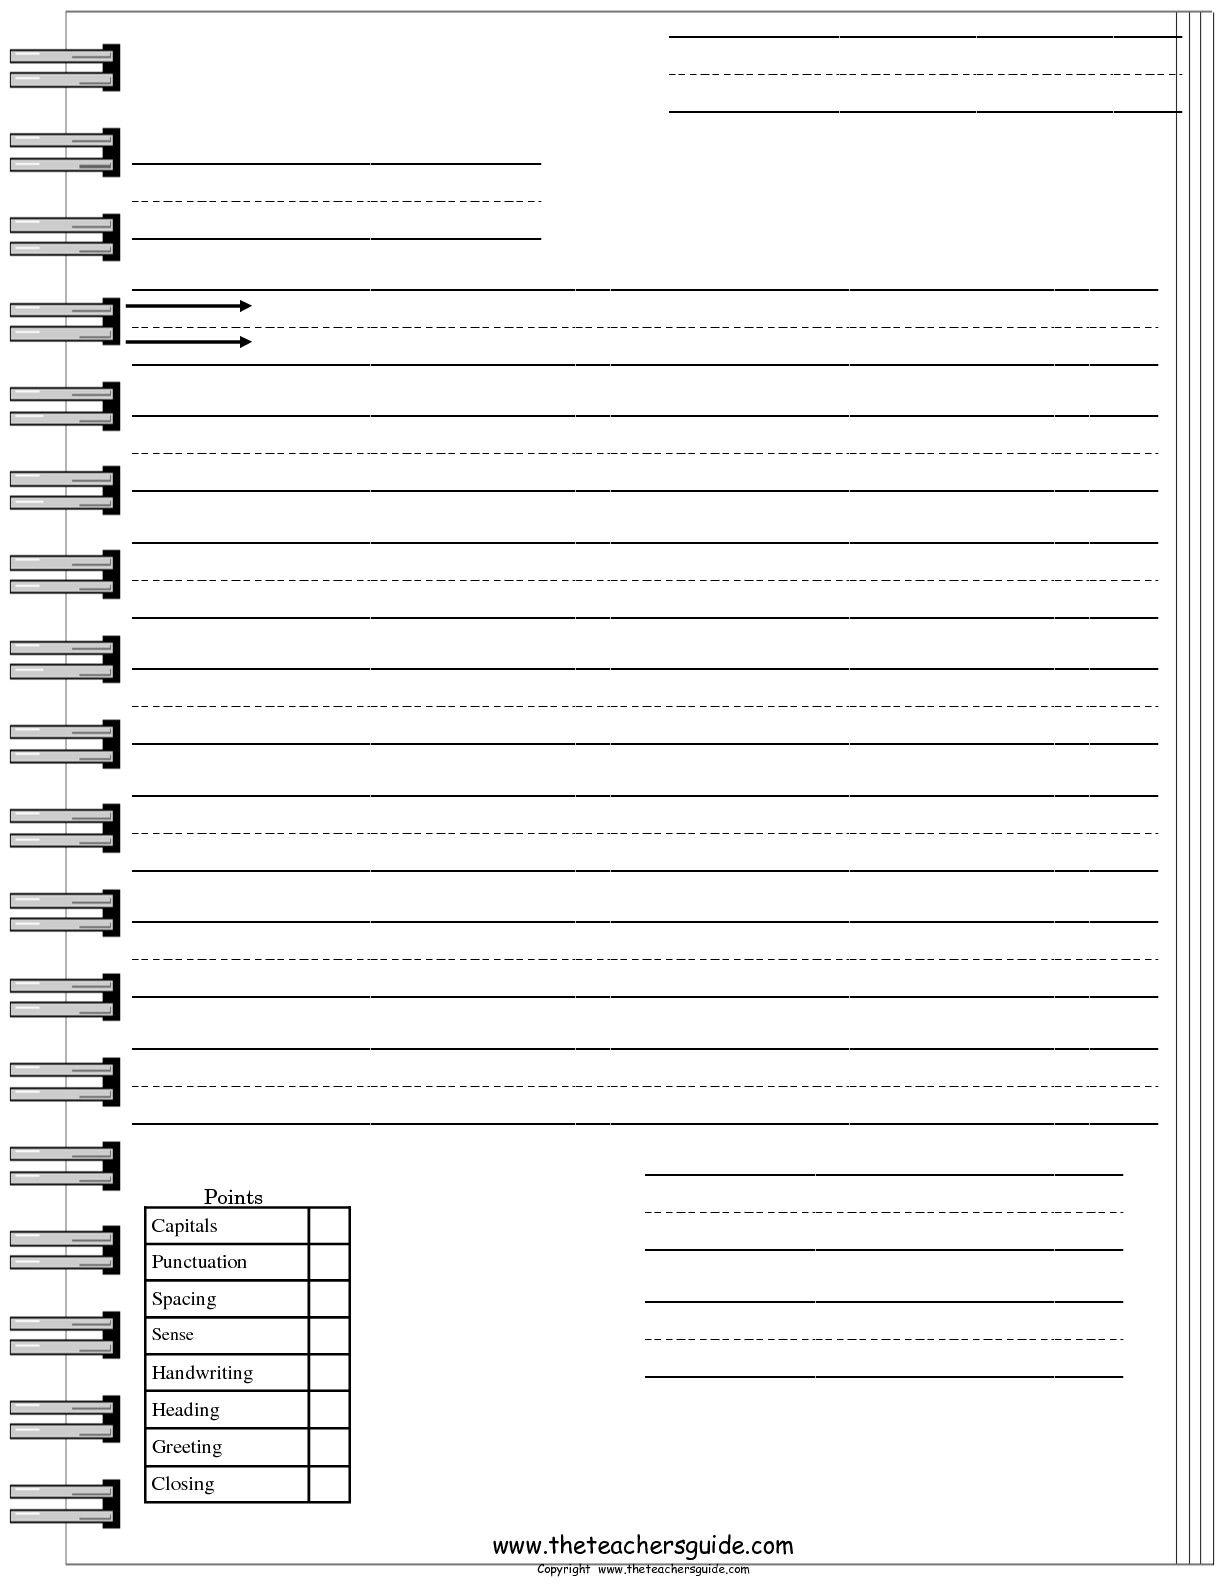 Friendly Letter Worksheets From The Teacher S Guide Letter Writing Template Friendly Letter Writing Letter Worksheets